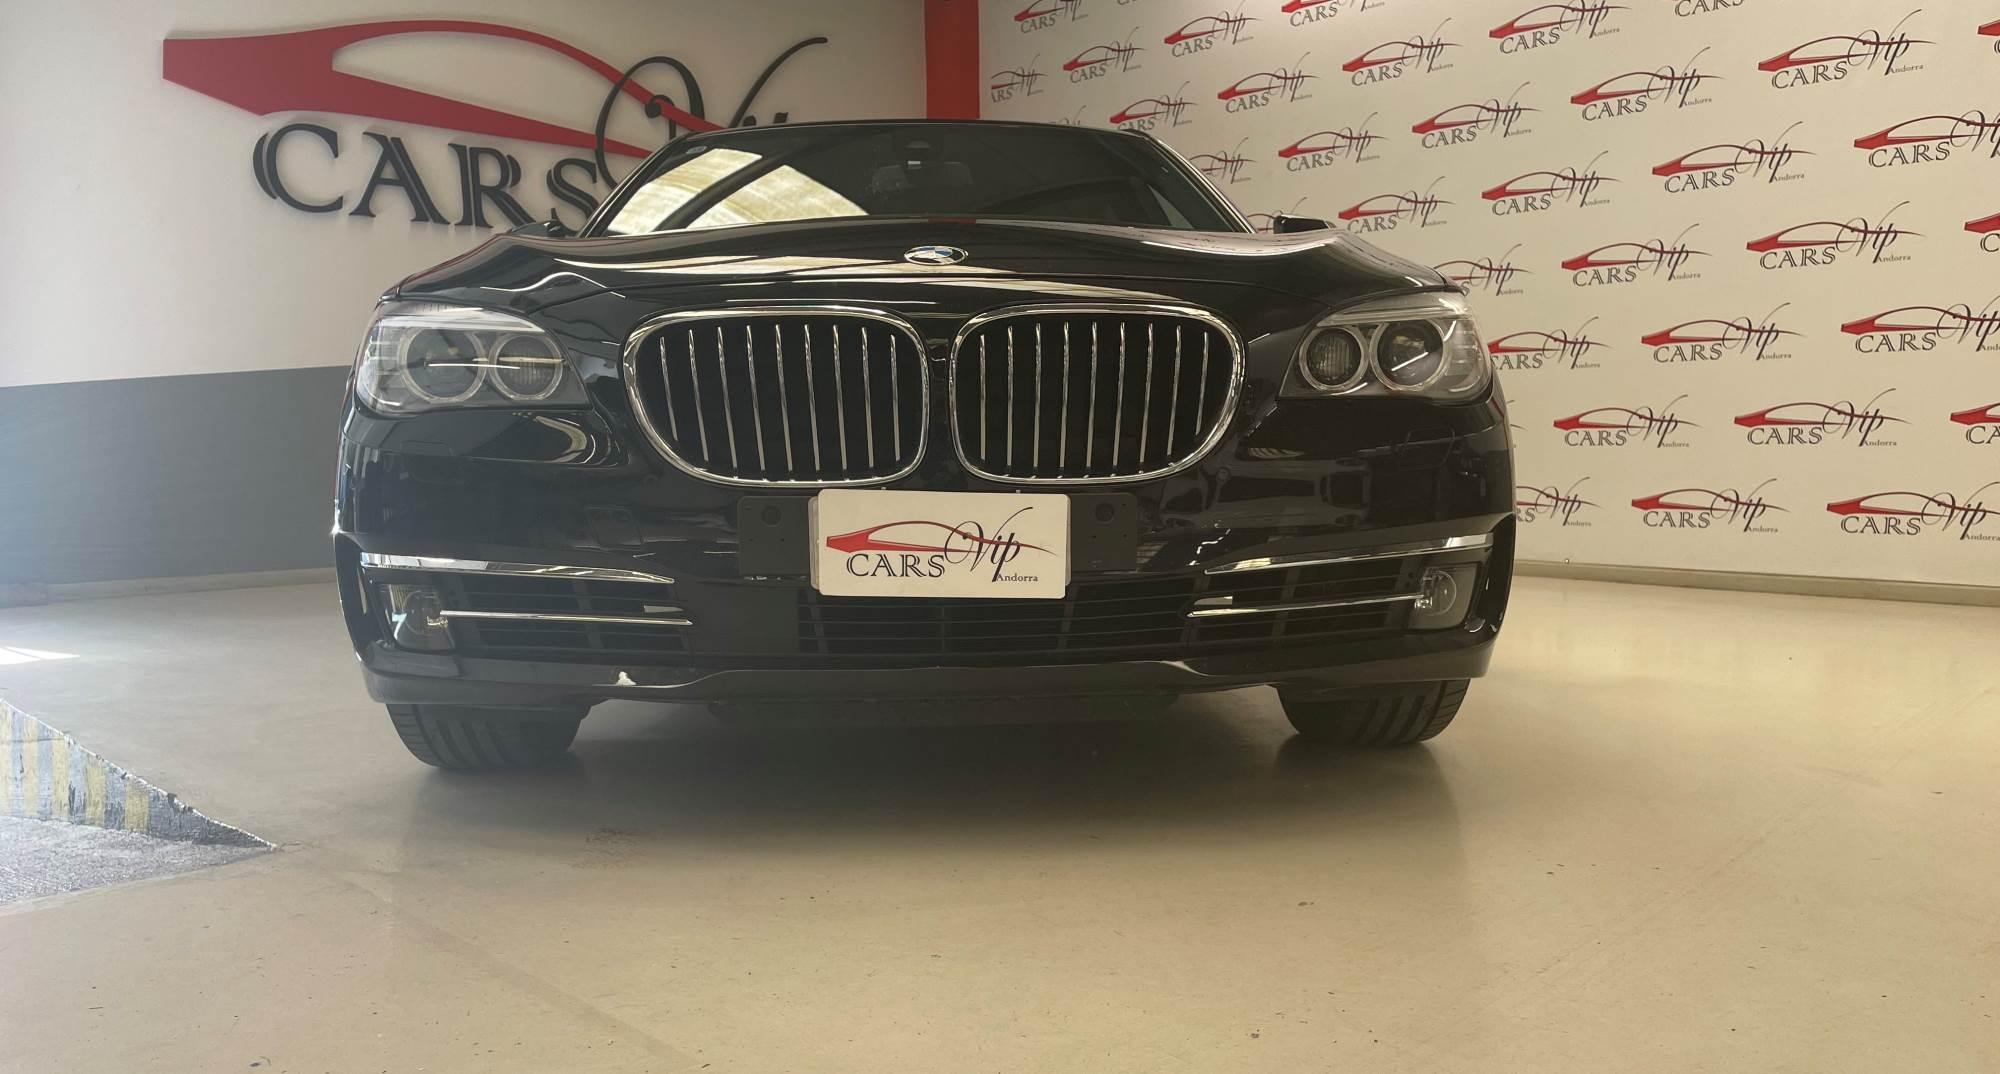 BMW - 730 - 730 D Xdrive 730 D Xdrive Dièsel  2015  115.000 Km